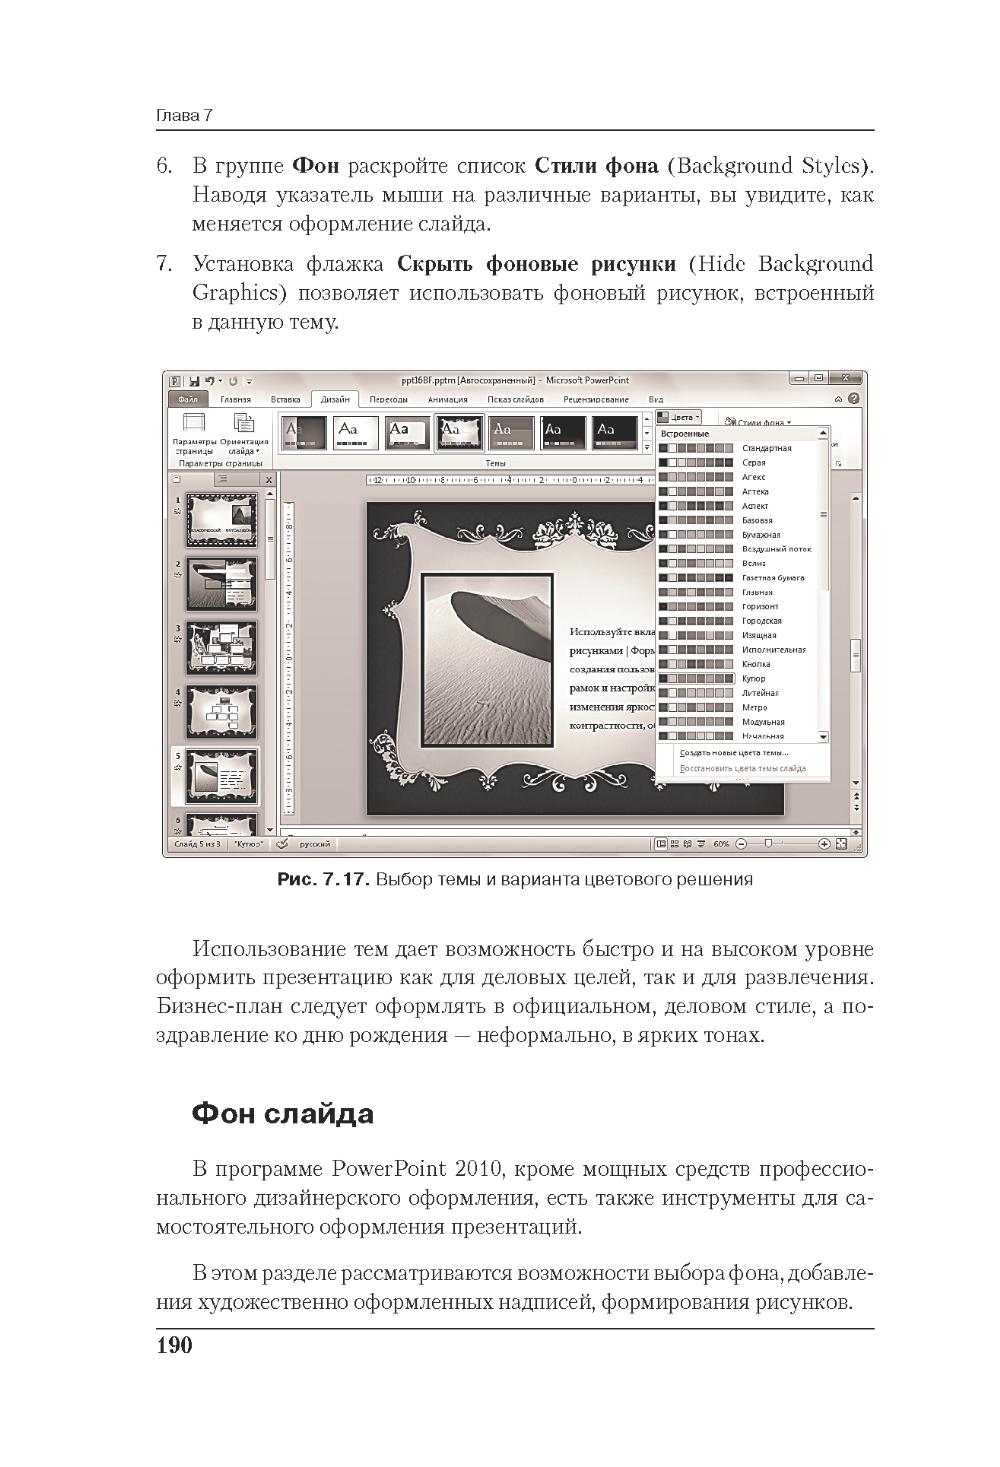 http://i6.imageban.ru/out/2013/12/13/f08173da9a8b71eed1bf35e814a5a270.jpg